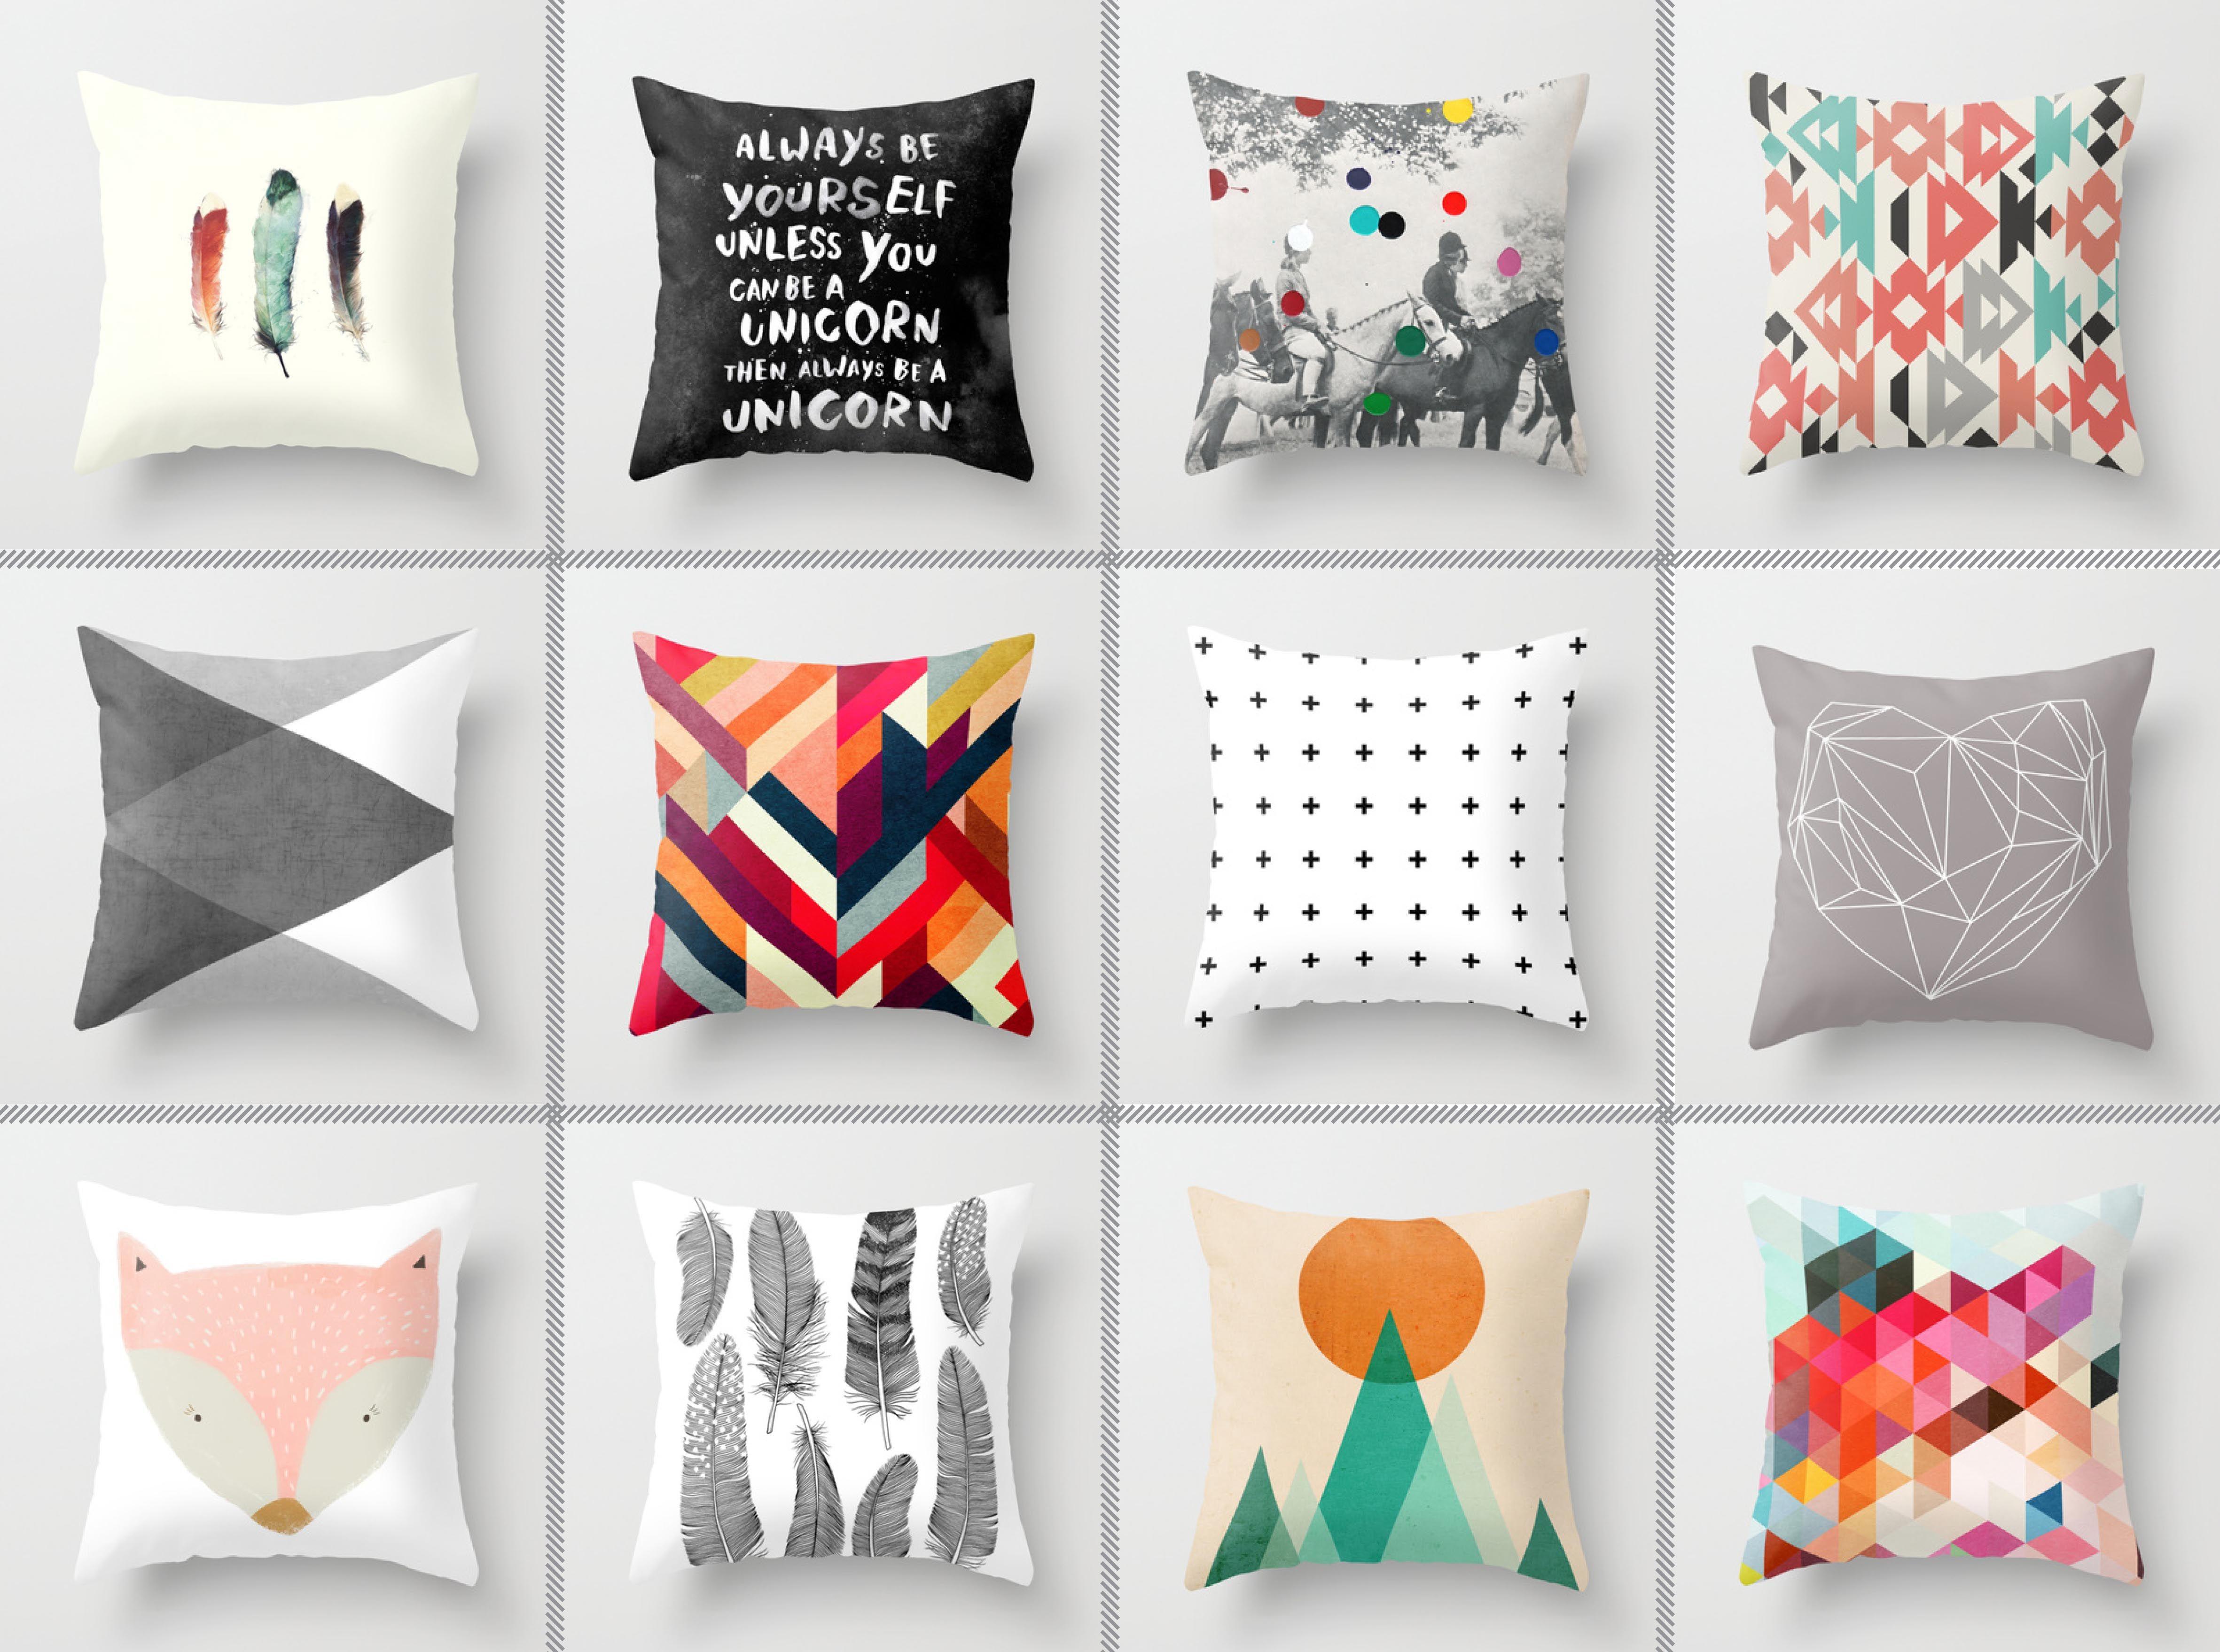 Diy Cojines.Diy Cojines Http Idoproyect Com Blog Cojines Cushions